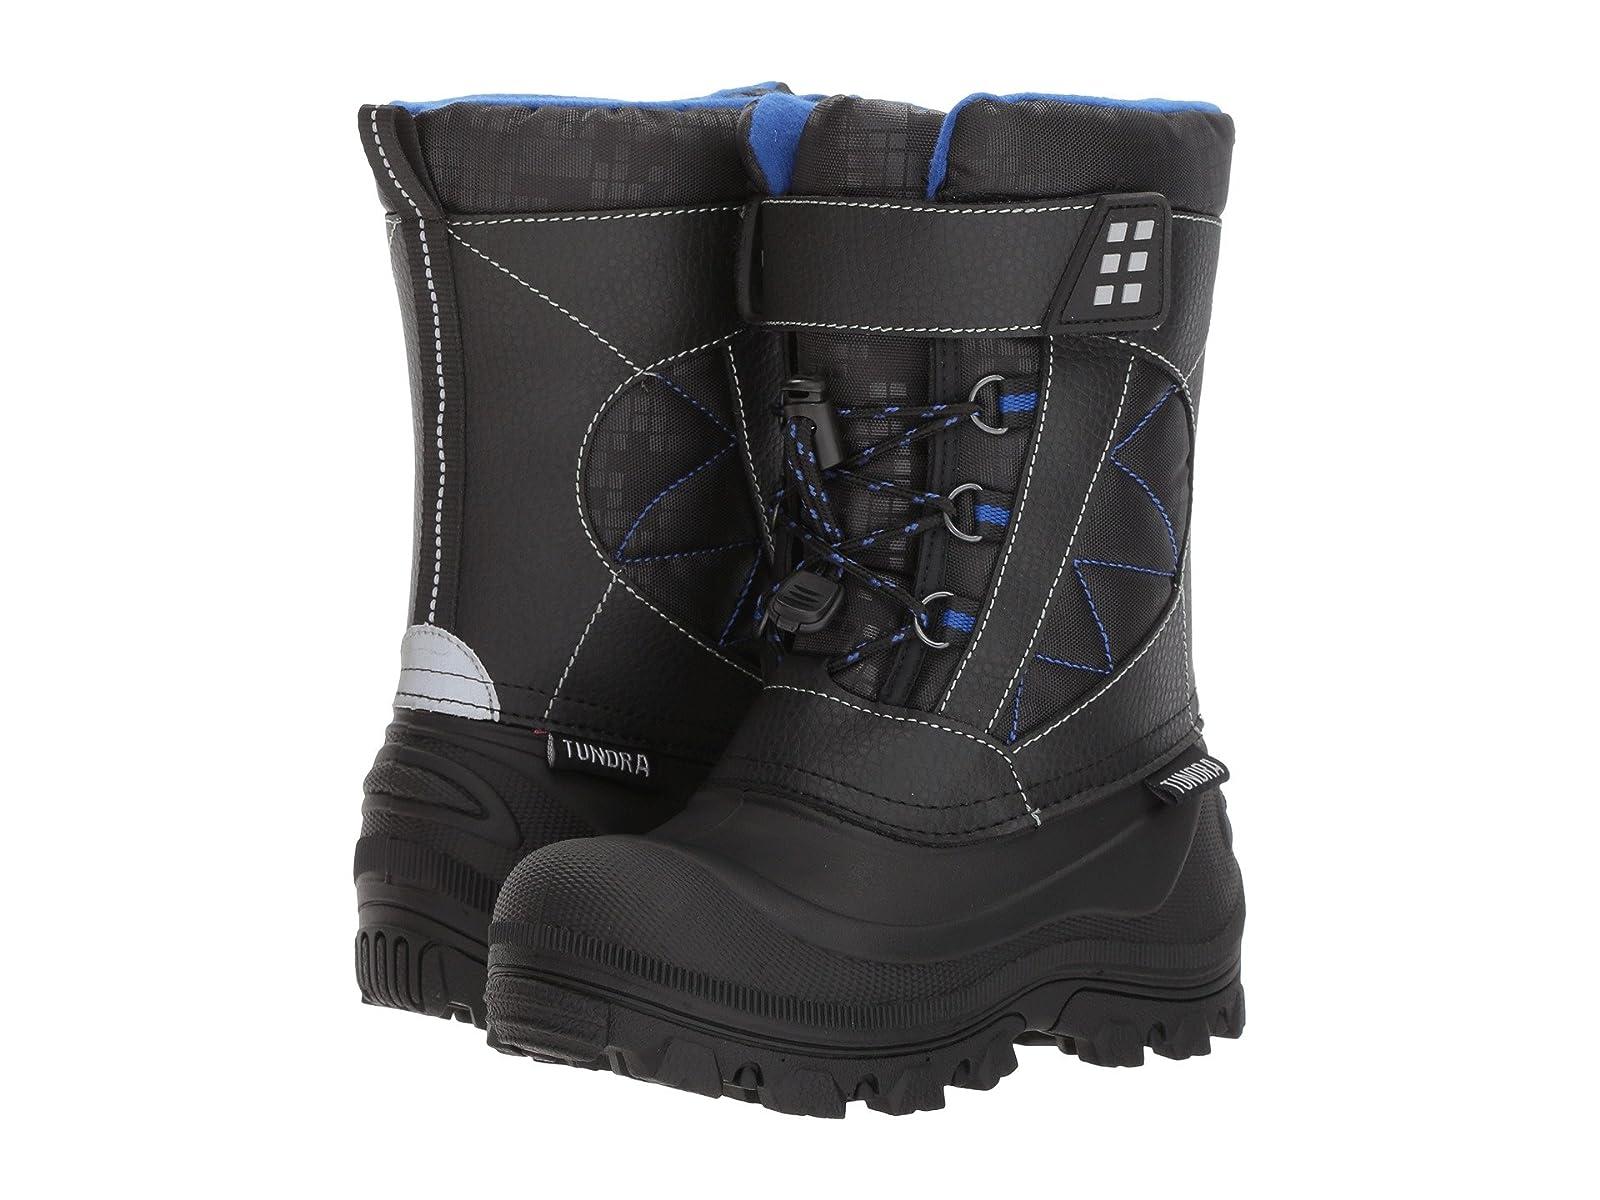 Tundra Boots Kids Nova (Little Kid/Big Kid)Cheap and distinctive eye-catching shoes